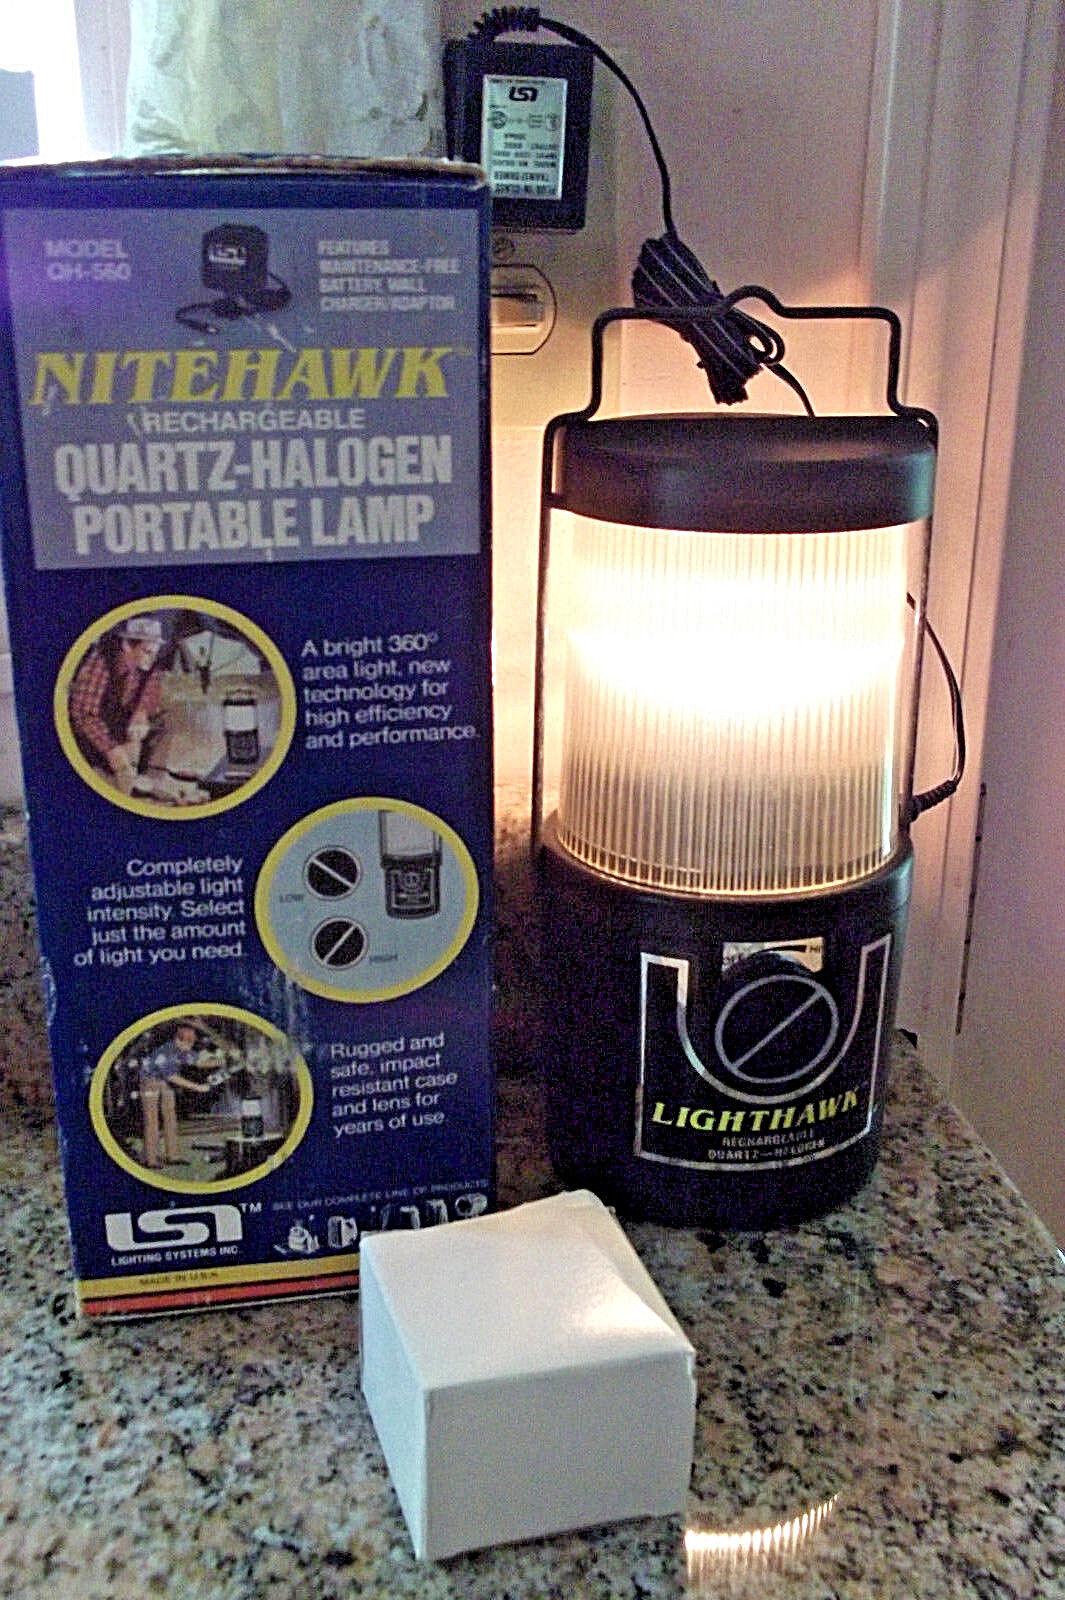 As Is WORKING Rechargeable LIGHTHAWK Quartz Halogen Lantern NITEHAWK BOX Adapter